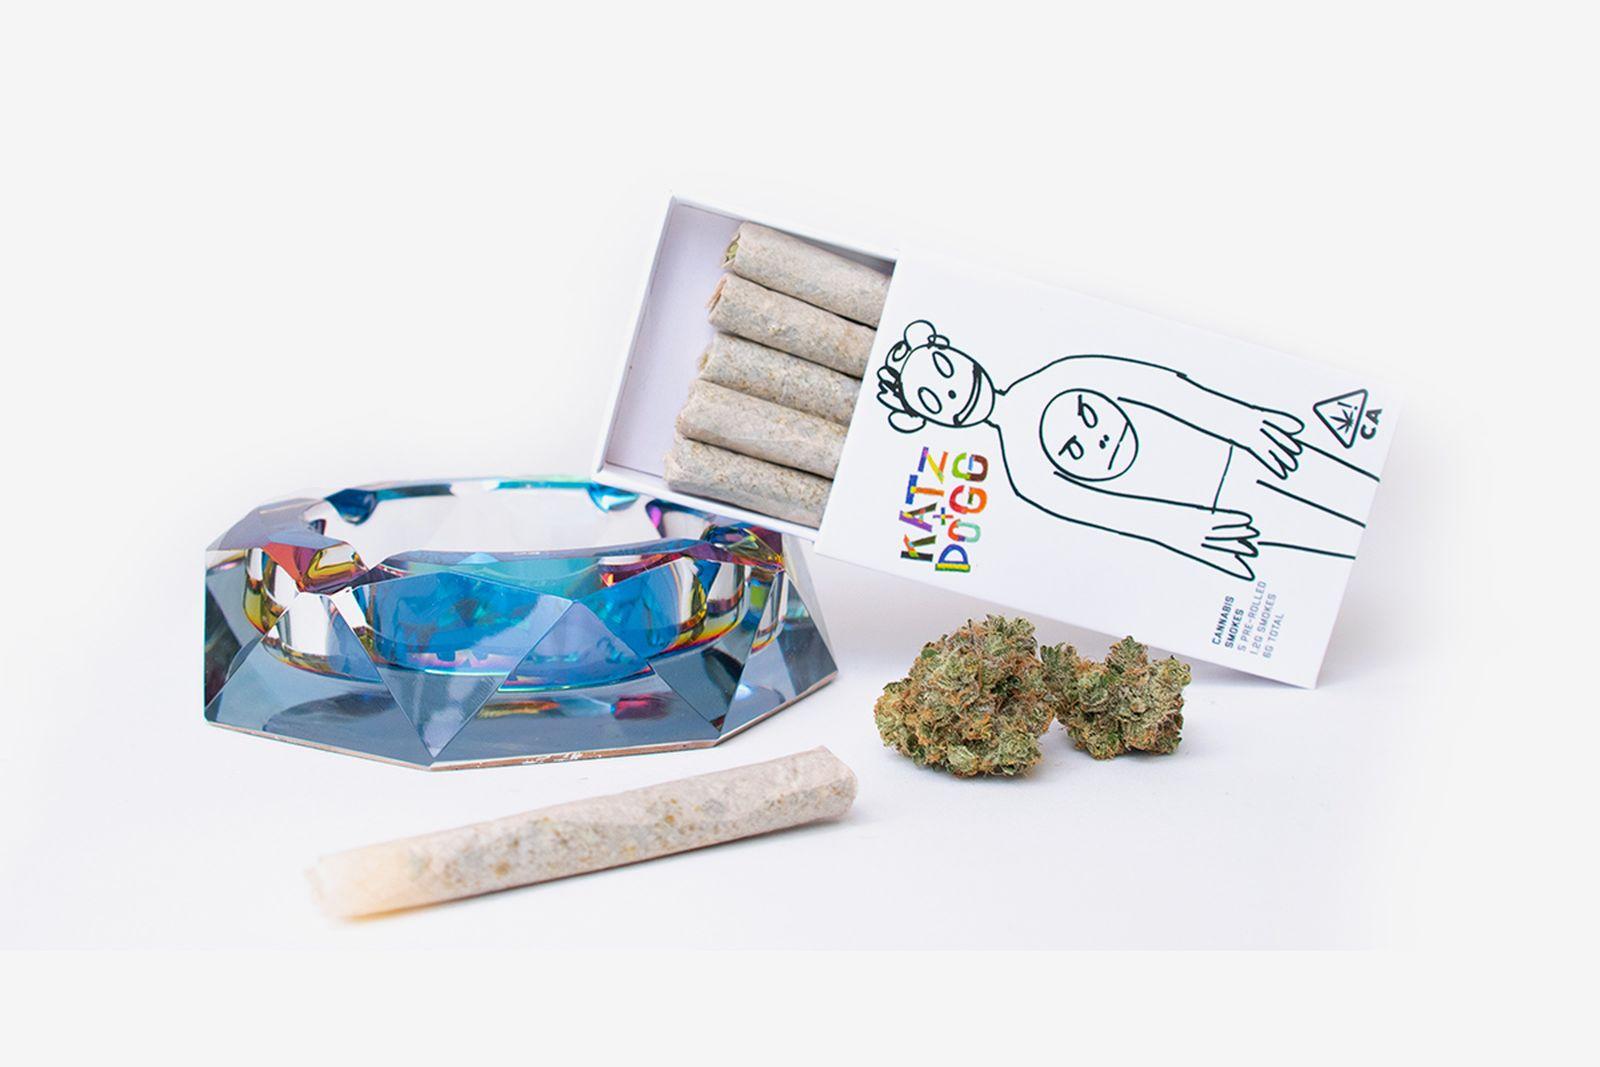 drx richard prince cannabis katz dogg